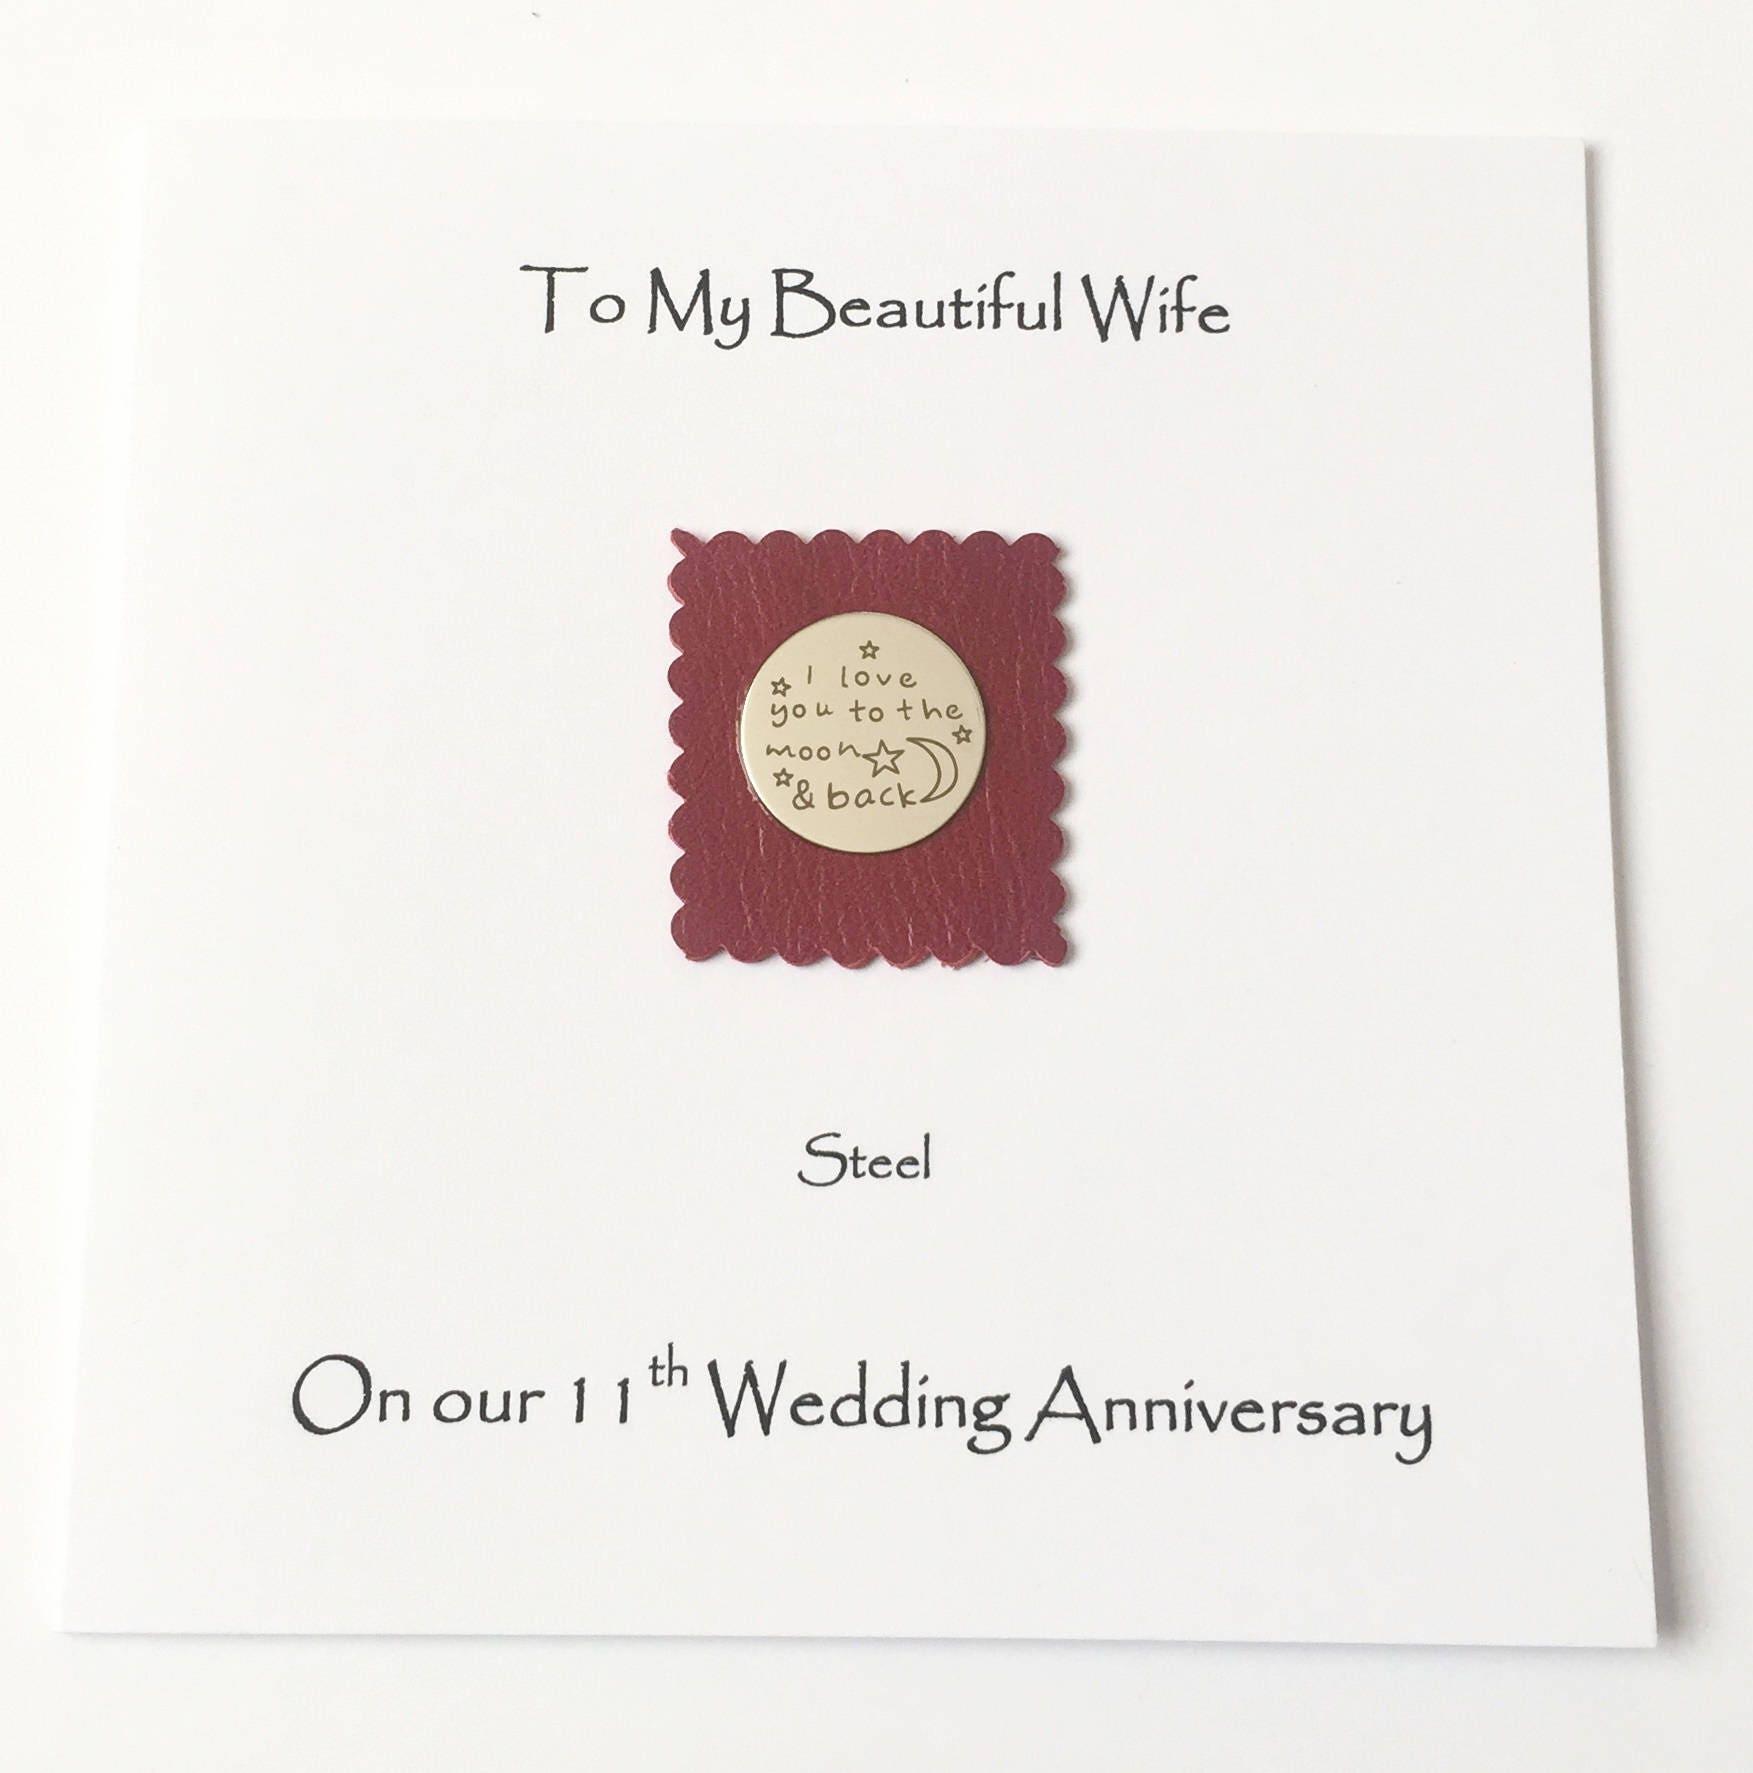 11th Wedding Anniversary Card Steel Anniversary Husband Wife Handmade Uk